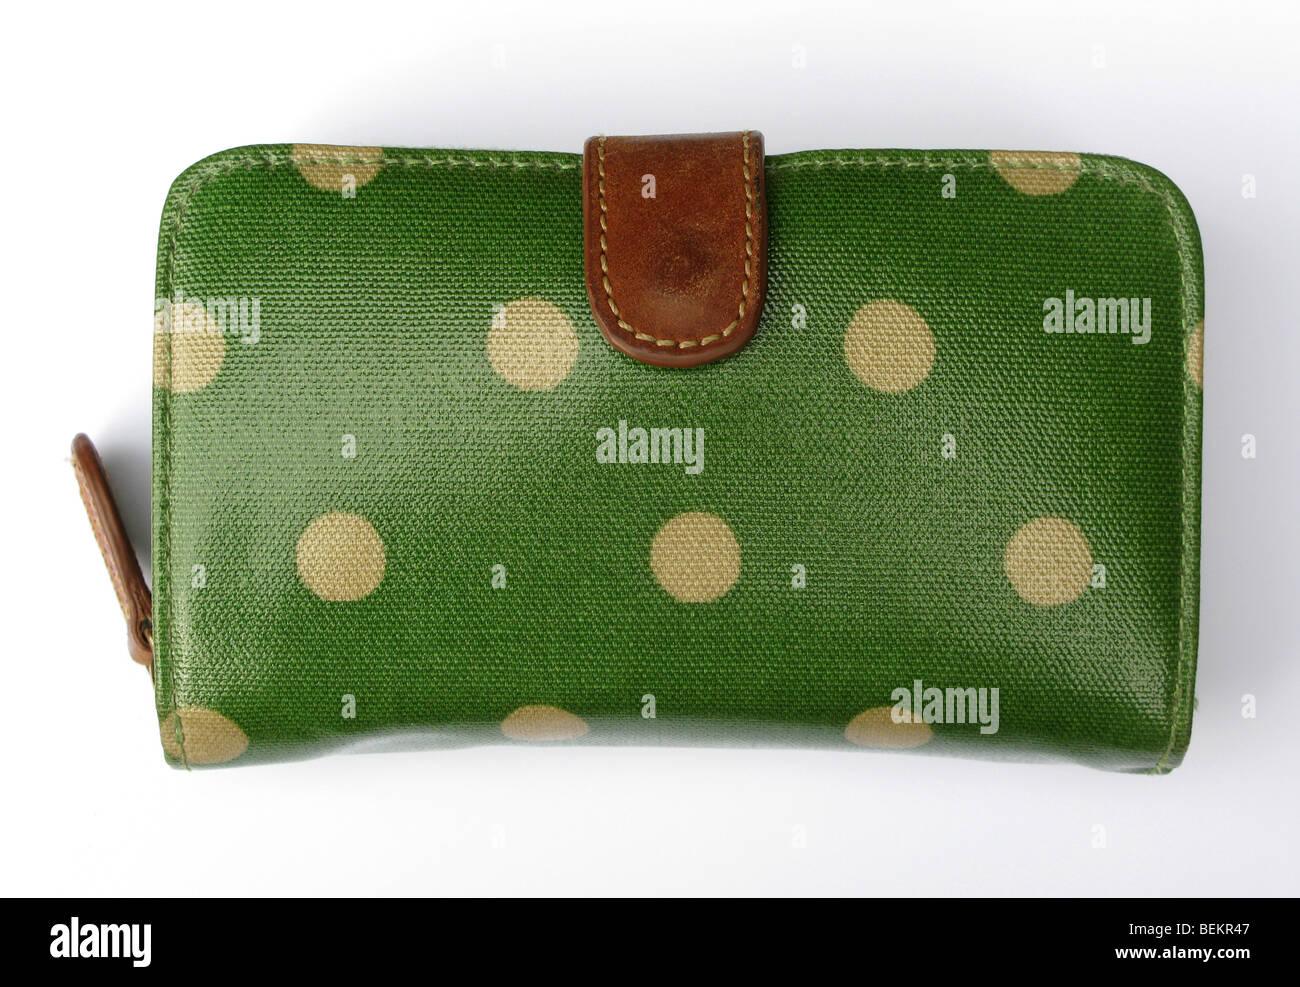 Green Cath Kidston purse on white background - Stock Image